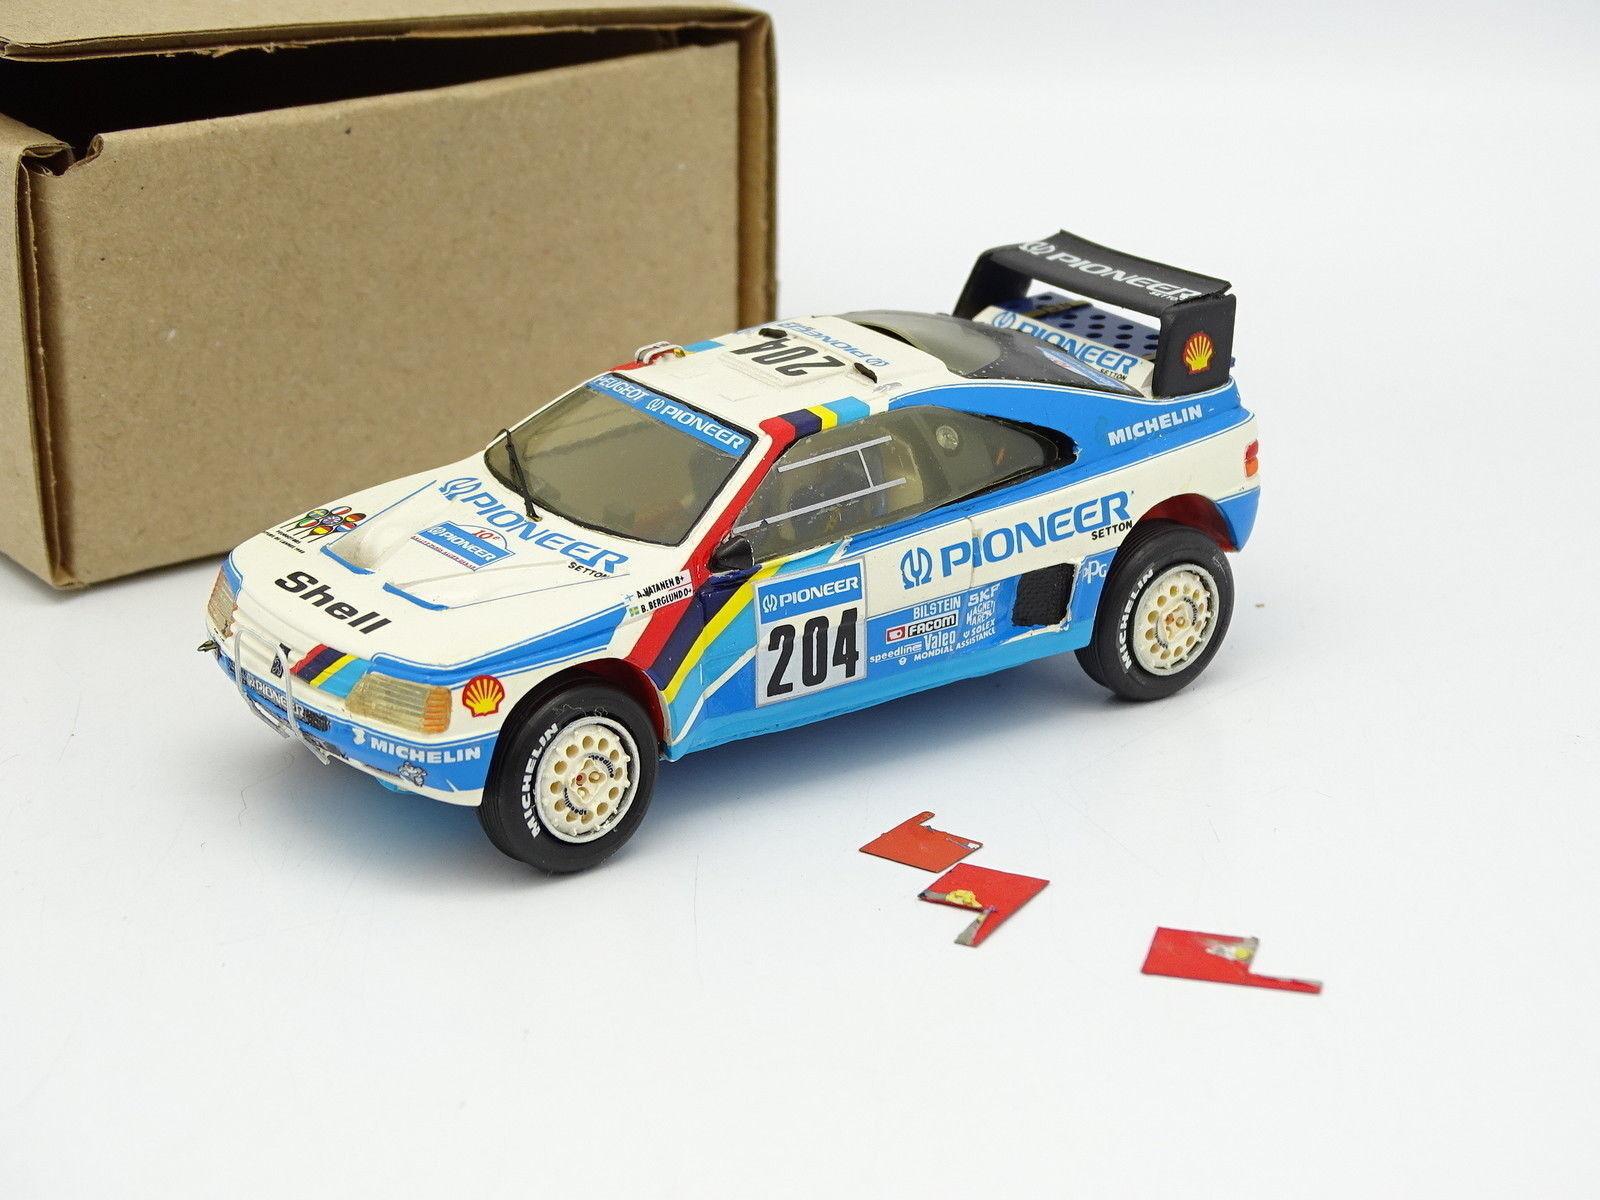 Starter Set Aufgebaut 1 43 - Peugeot 405 T16 Rallye Paris Dakar 1988 Nr.204